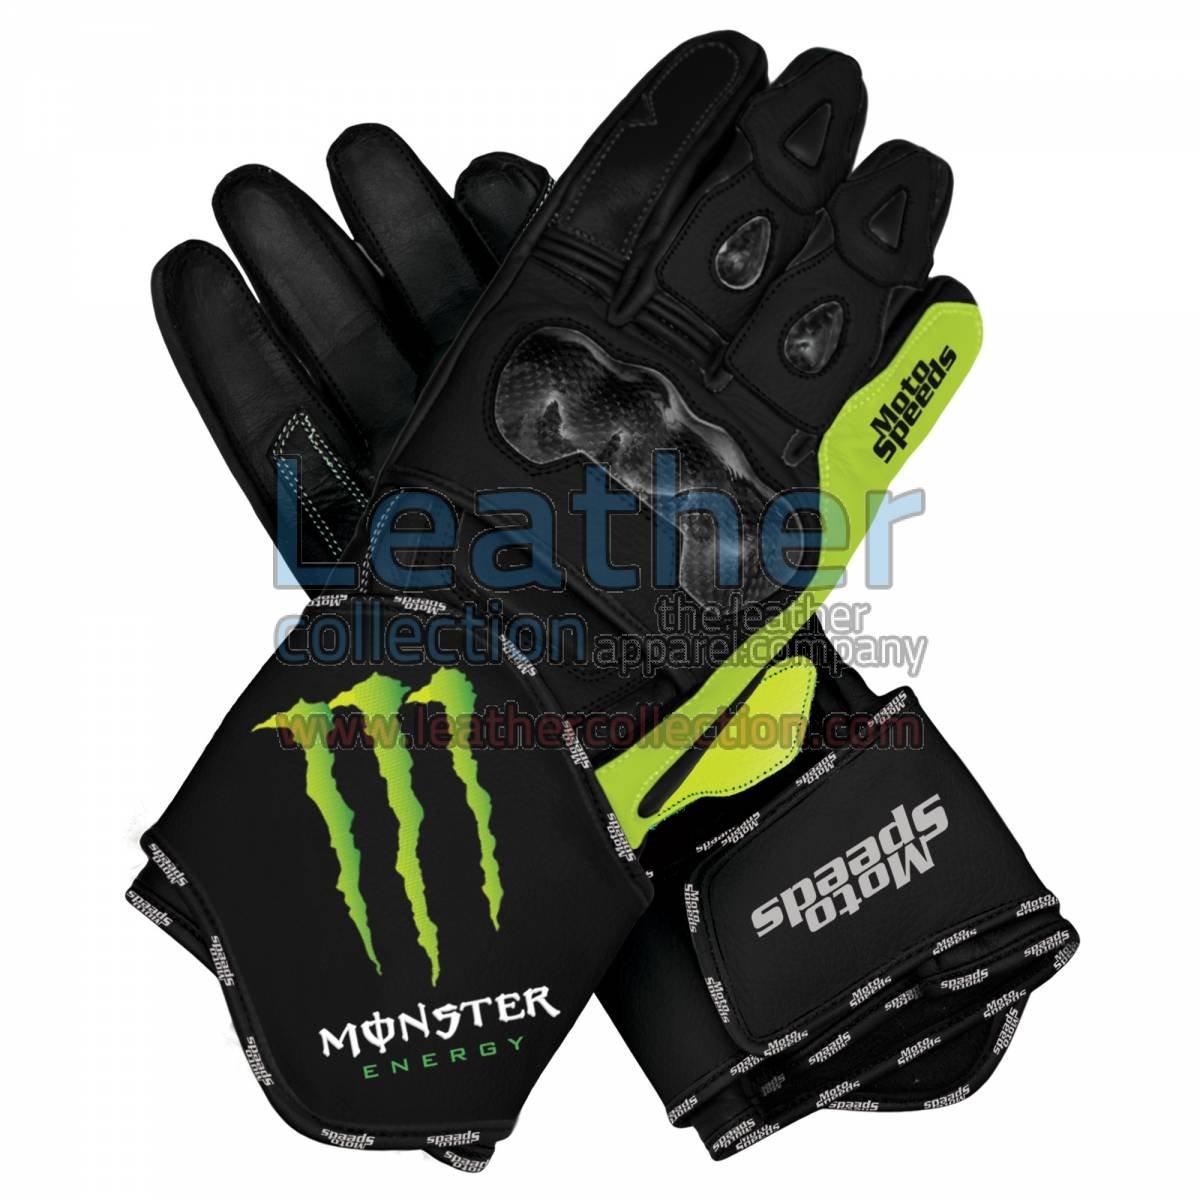 Monster Motorbike Race Leather Gloves